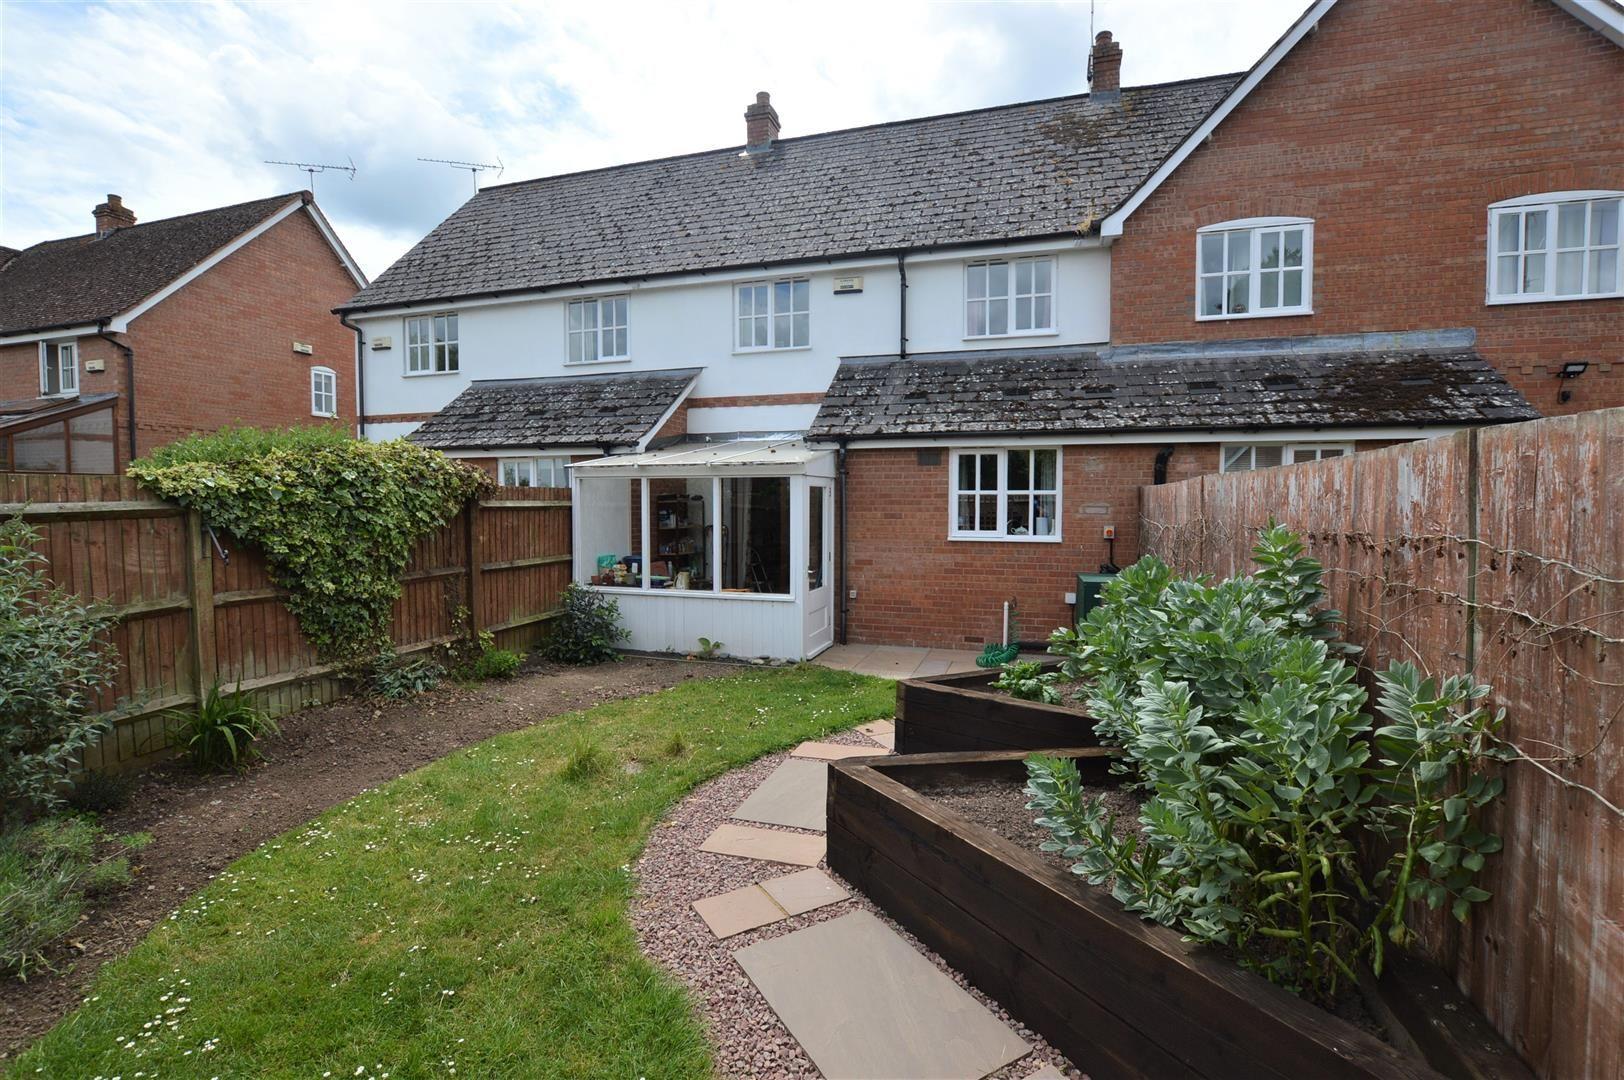 3 bed terraced for sale in Eardisley  - Property Image 7